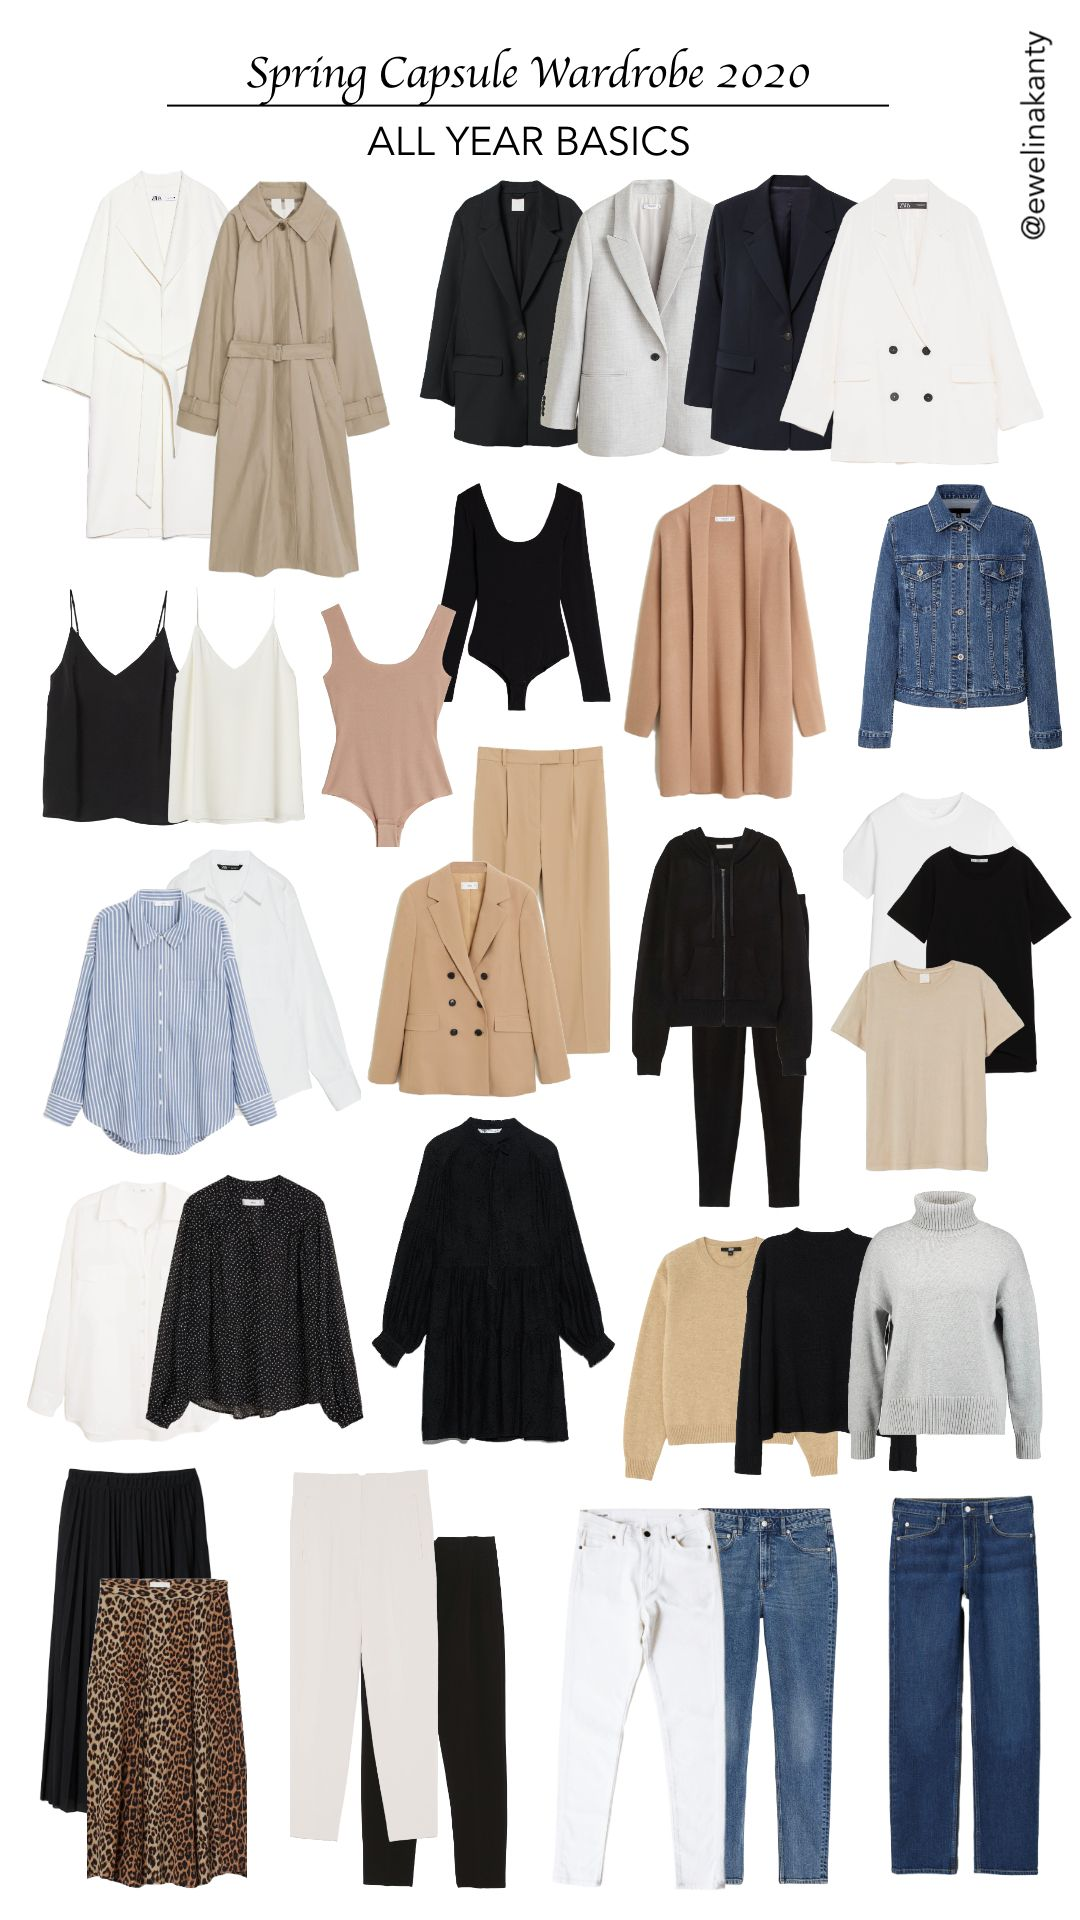 Spring Capsule Wardrobe 2020 - THE BASICS